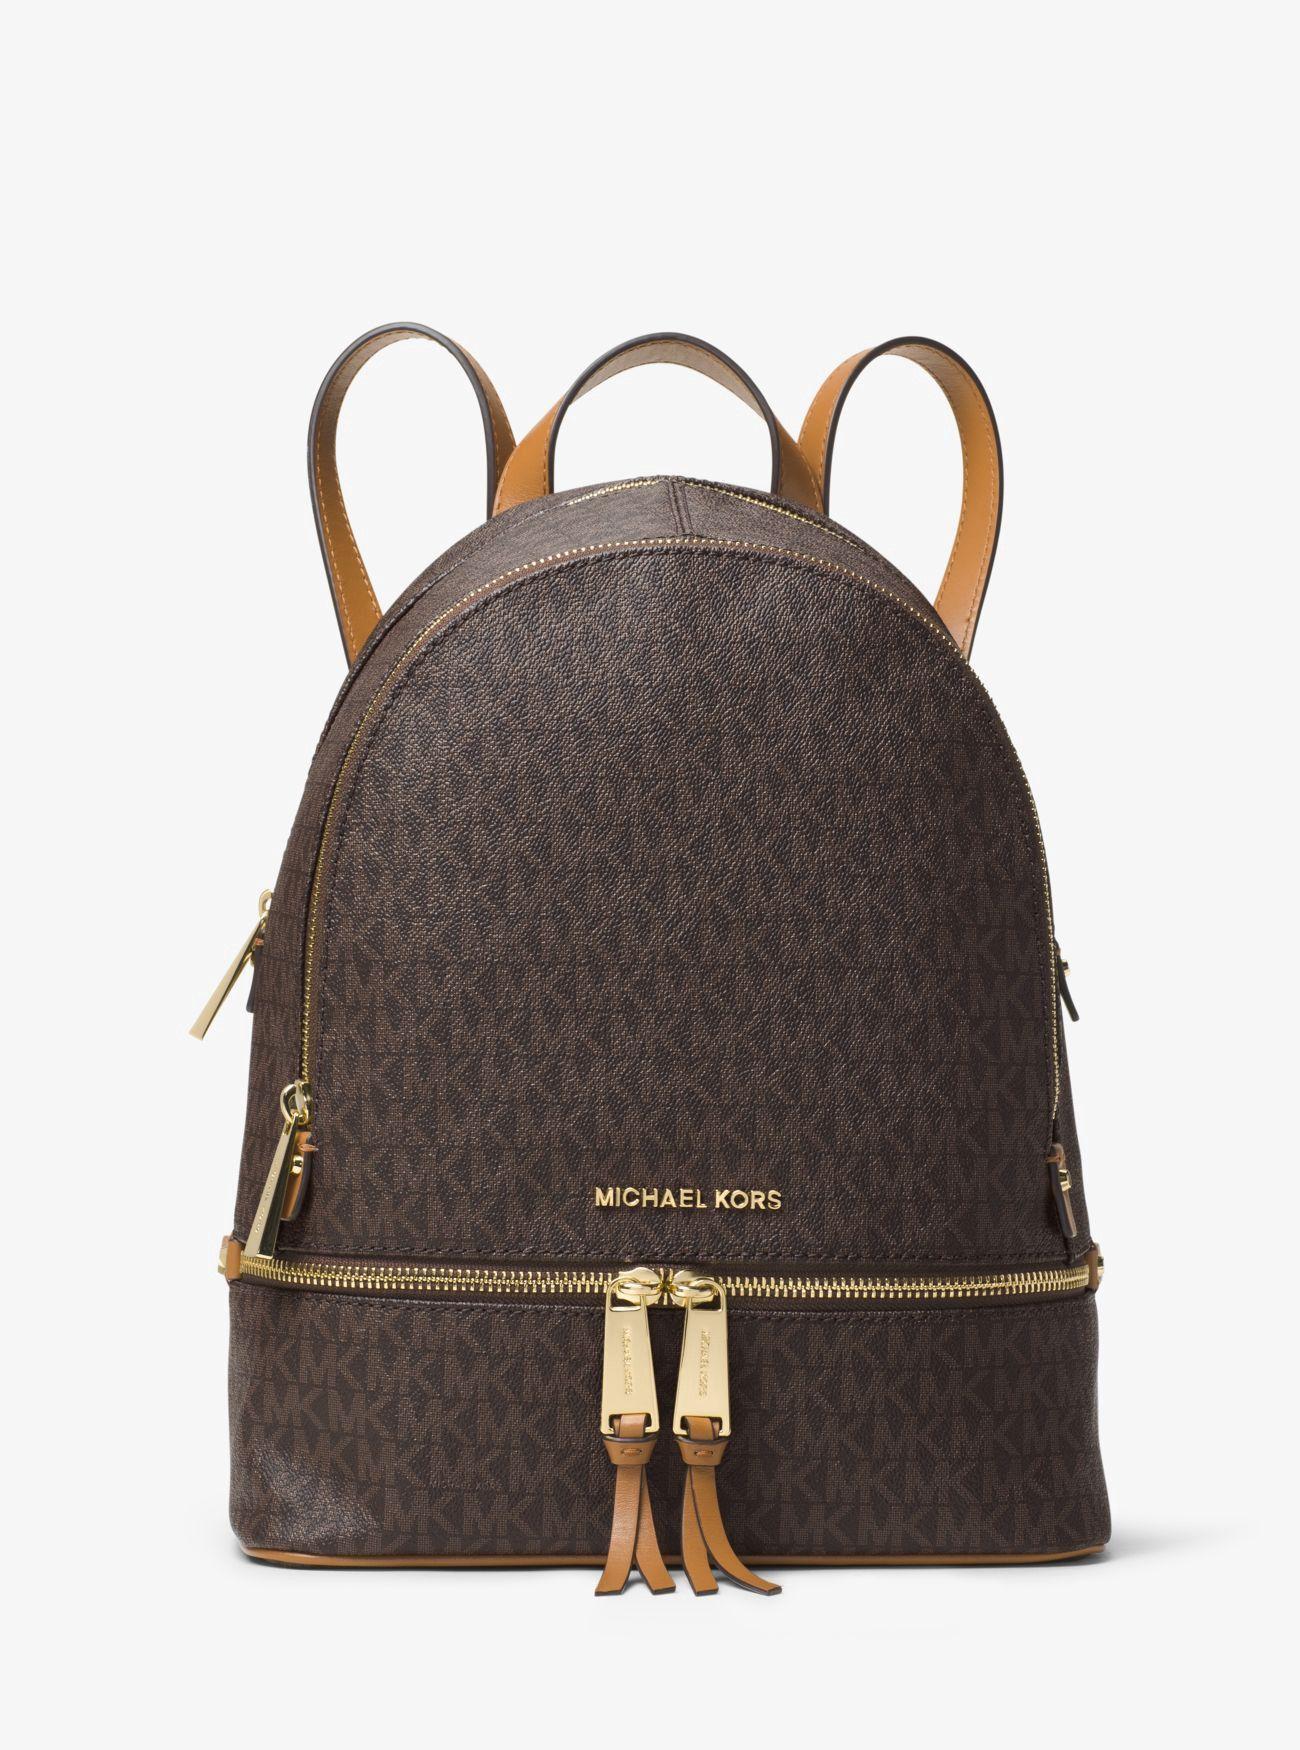 13fc970462 Michael Kors Rhea Medium Backpack - Vanilla in 2019   Products ...